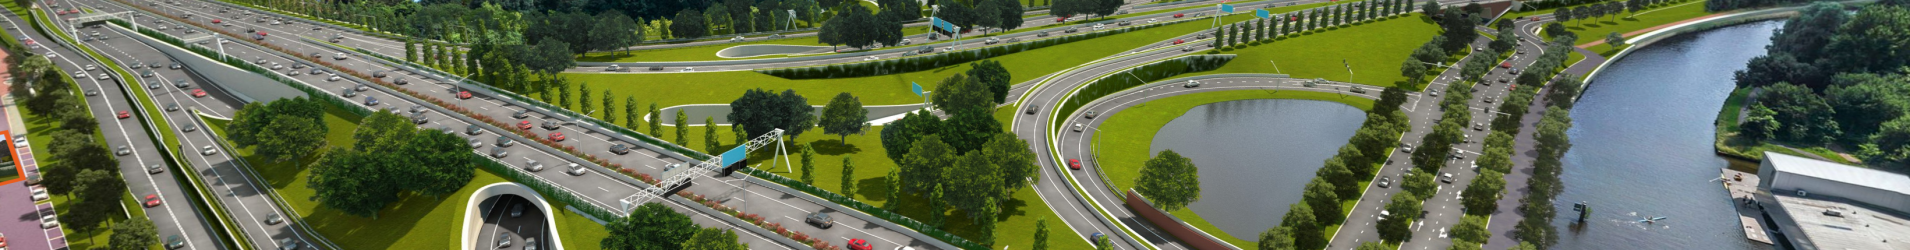 Wegontwerp Aanpak Ring Zuid Groningen in 3D.